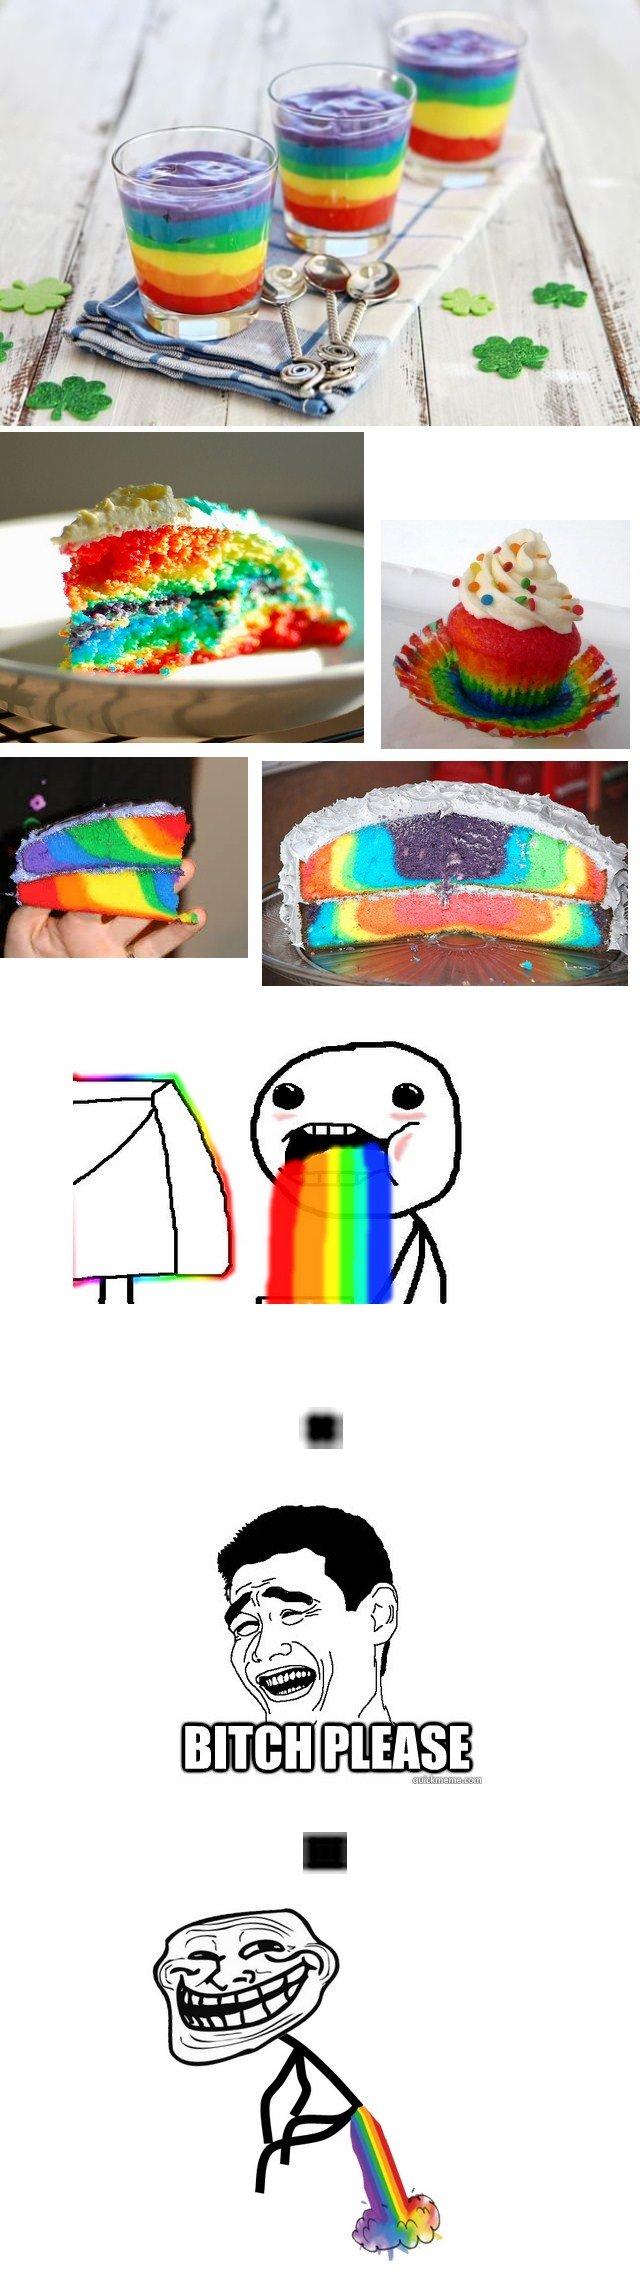 Pukin' rainbows?! Please.... . Pukin' rainbows?! Please